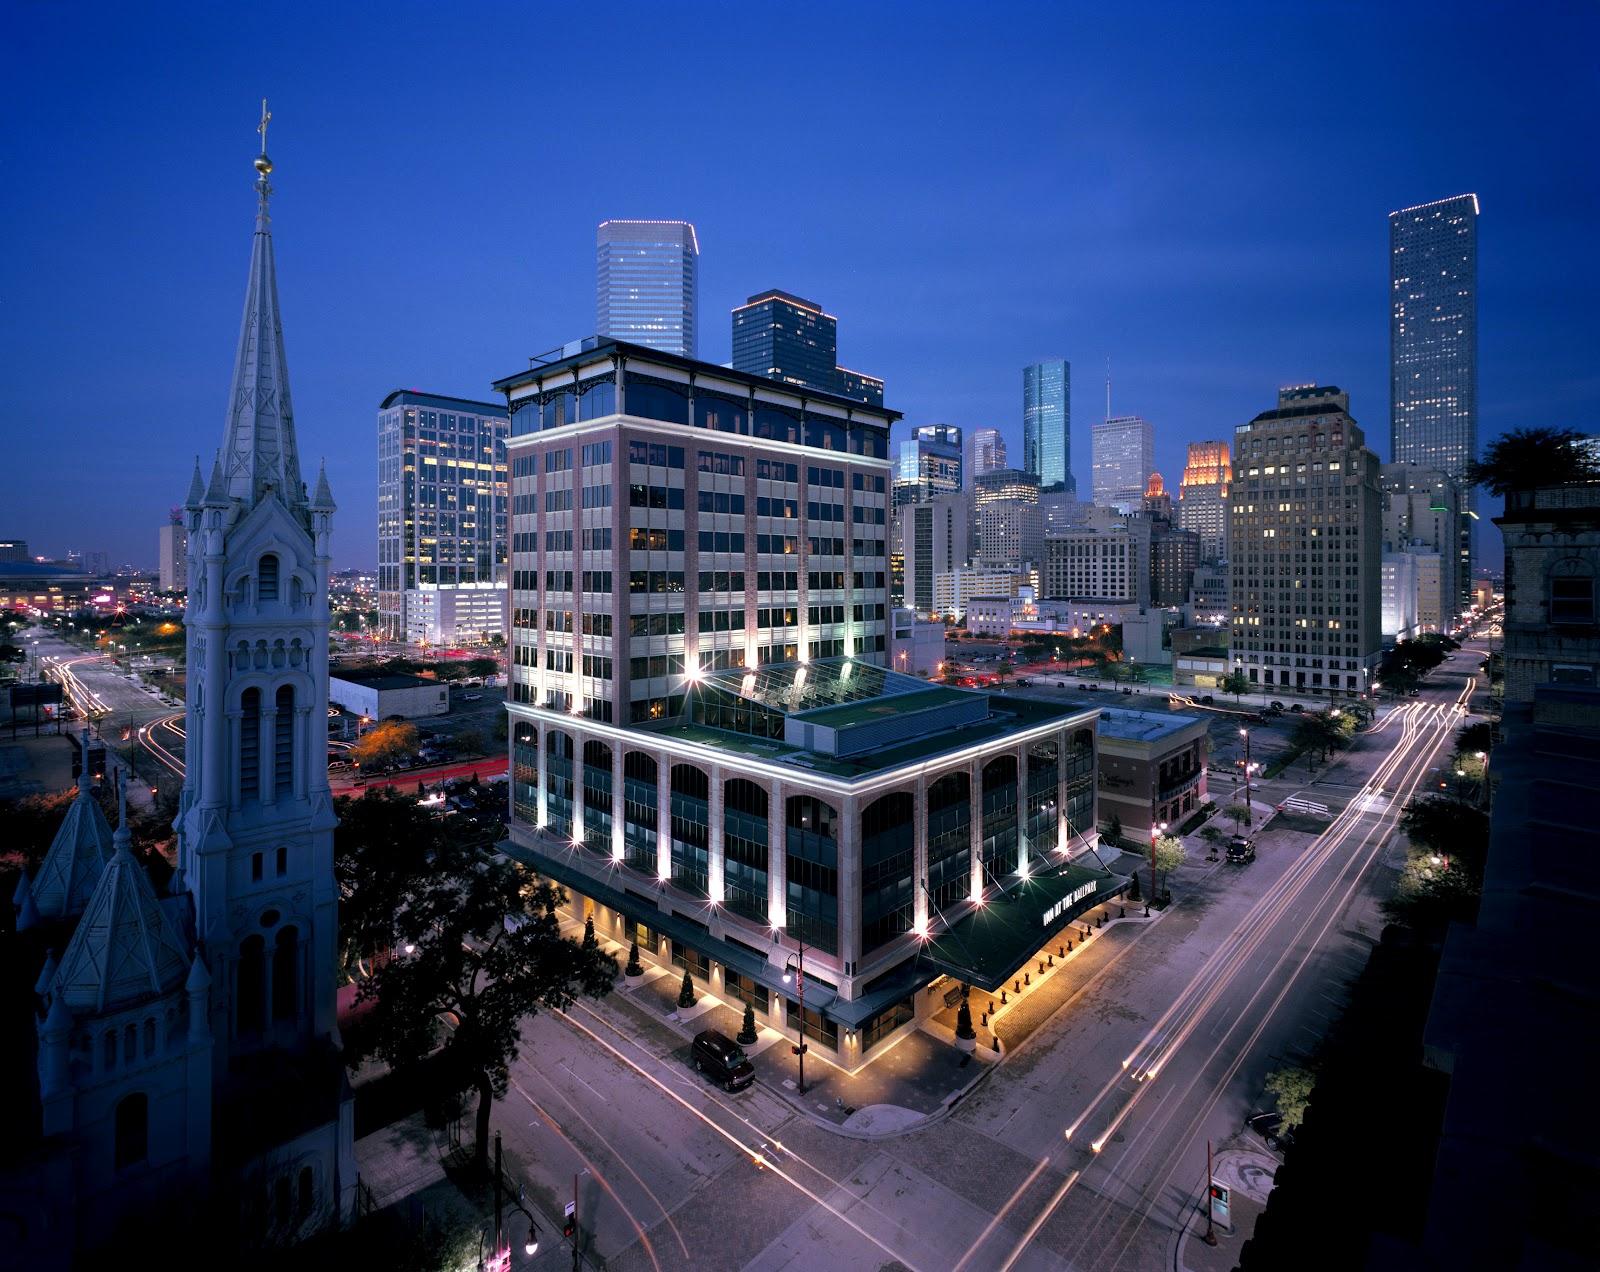 Travel Amp Adventures Houston A Voyage To Houston Texas United States Of America